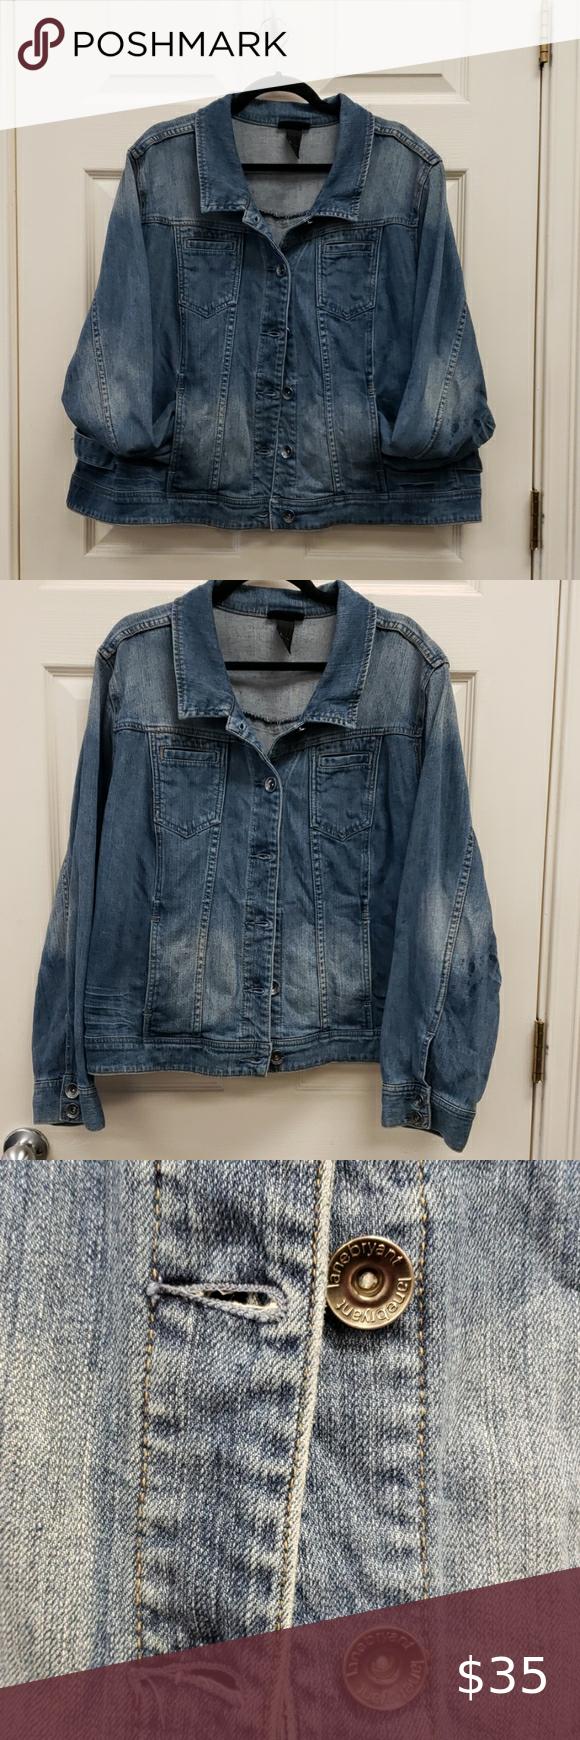 Lane Bryant Denim Jacket Blue Size 26 Denim Jacket Jackets Lane Bryant [ 1740 x 580 Pixel ]